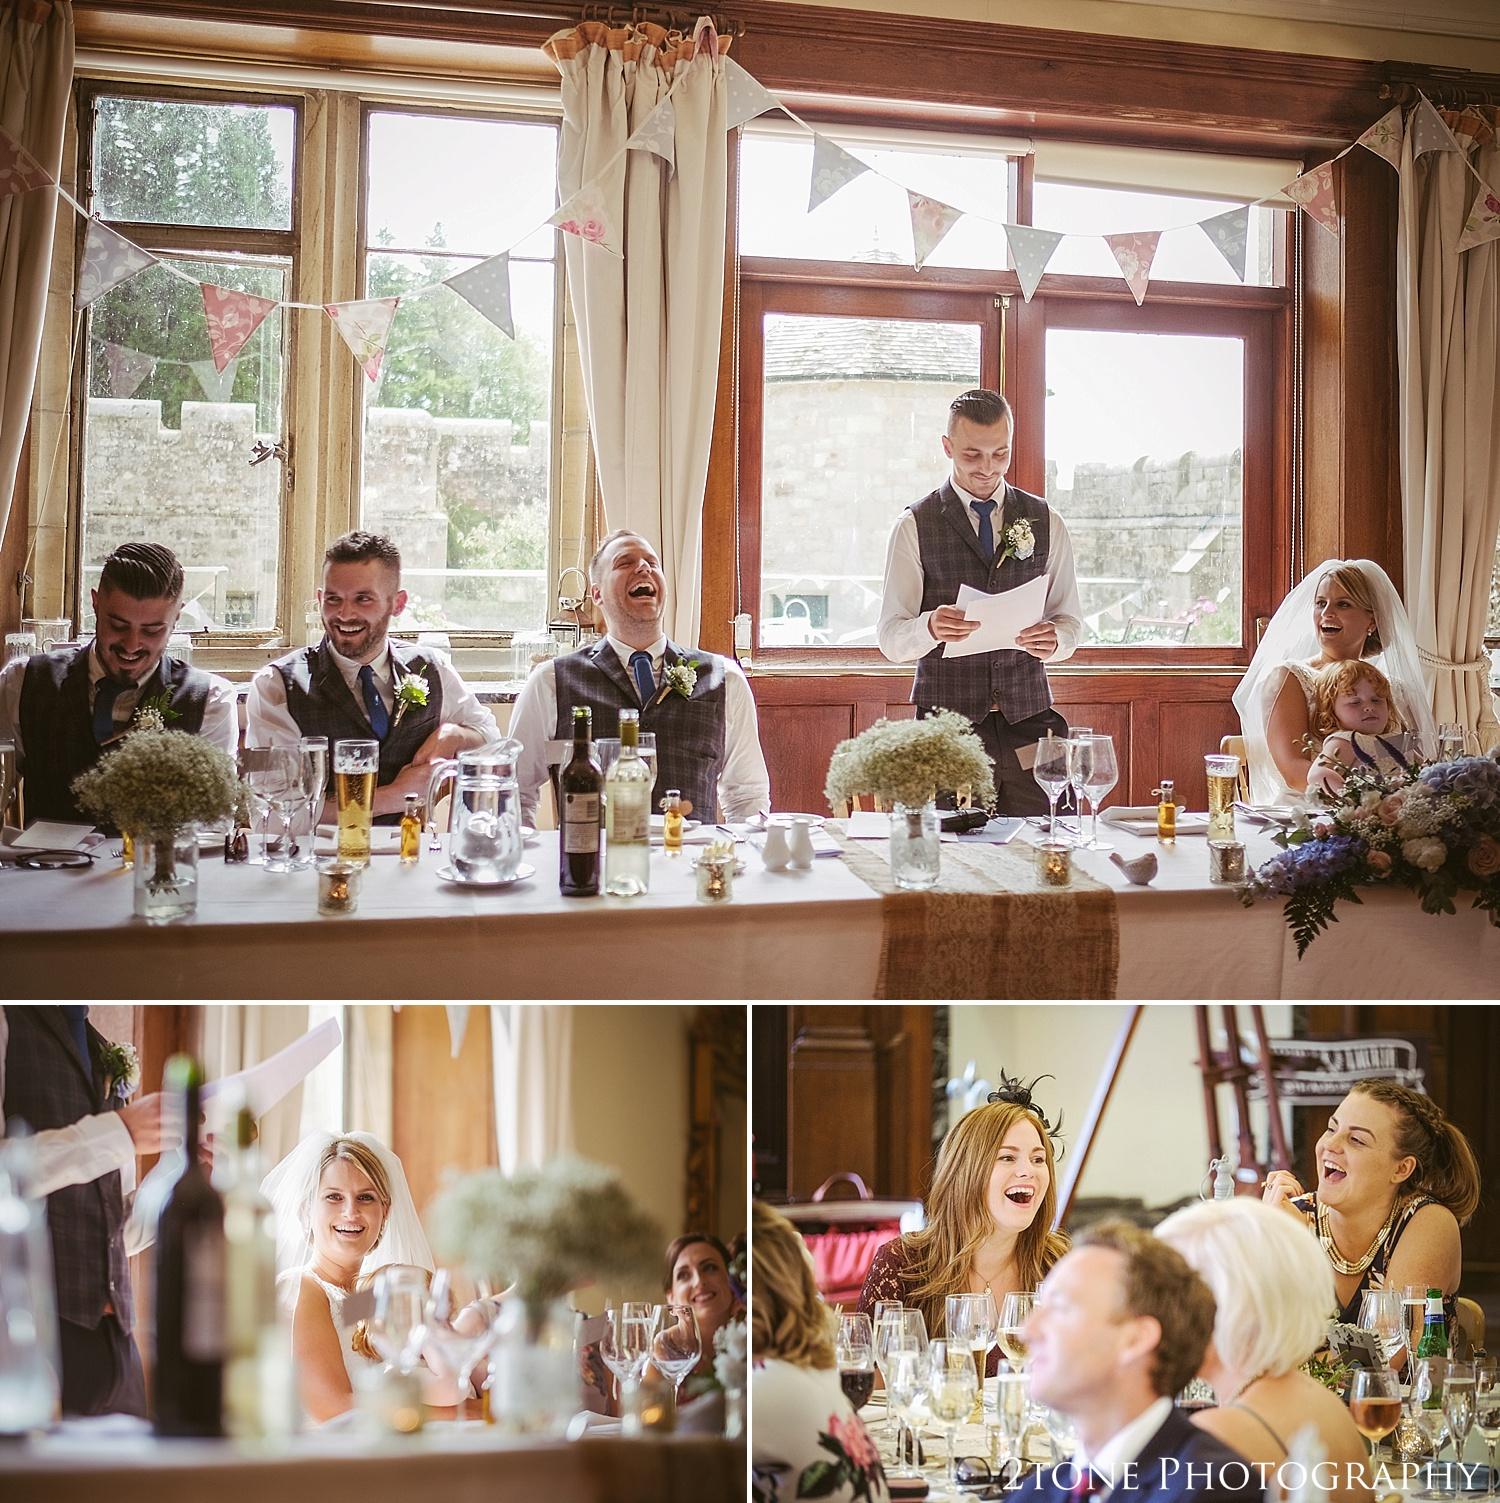 Speeches. Wedding photography at Guyzance Hall by wedding photographers www.2tonephotography.co.uk